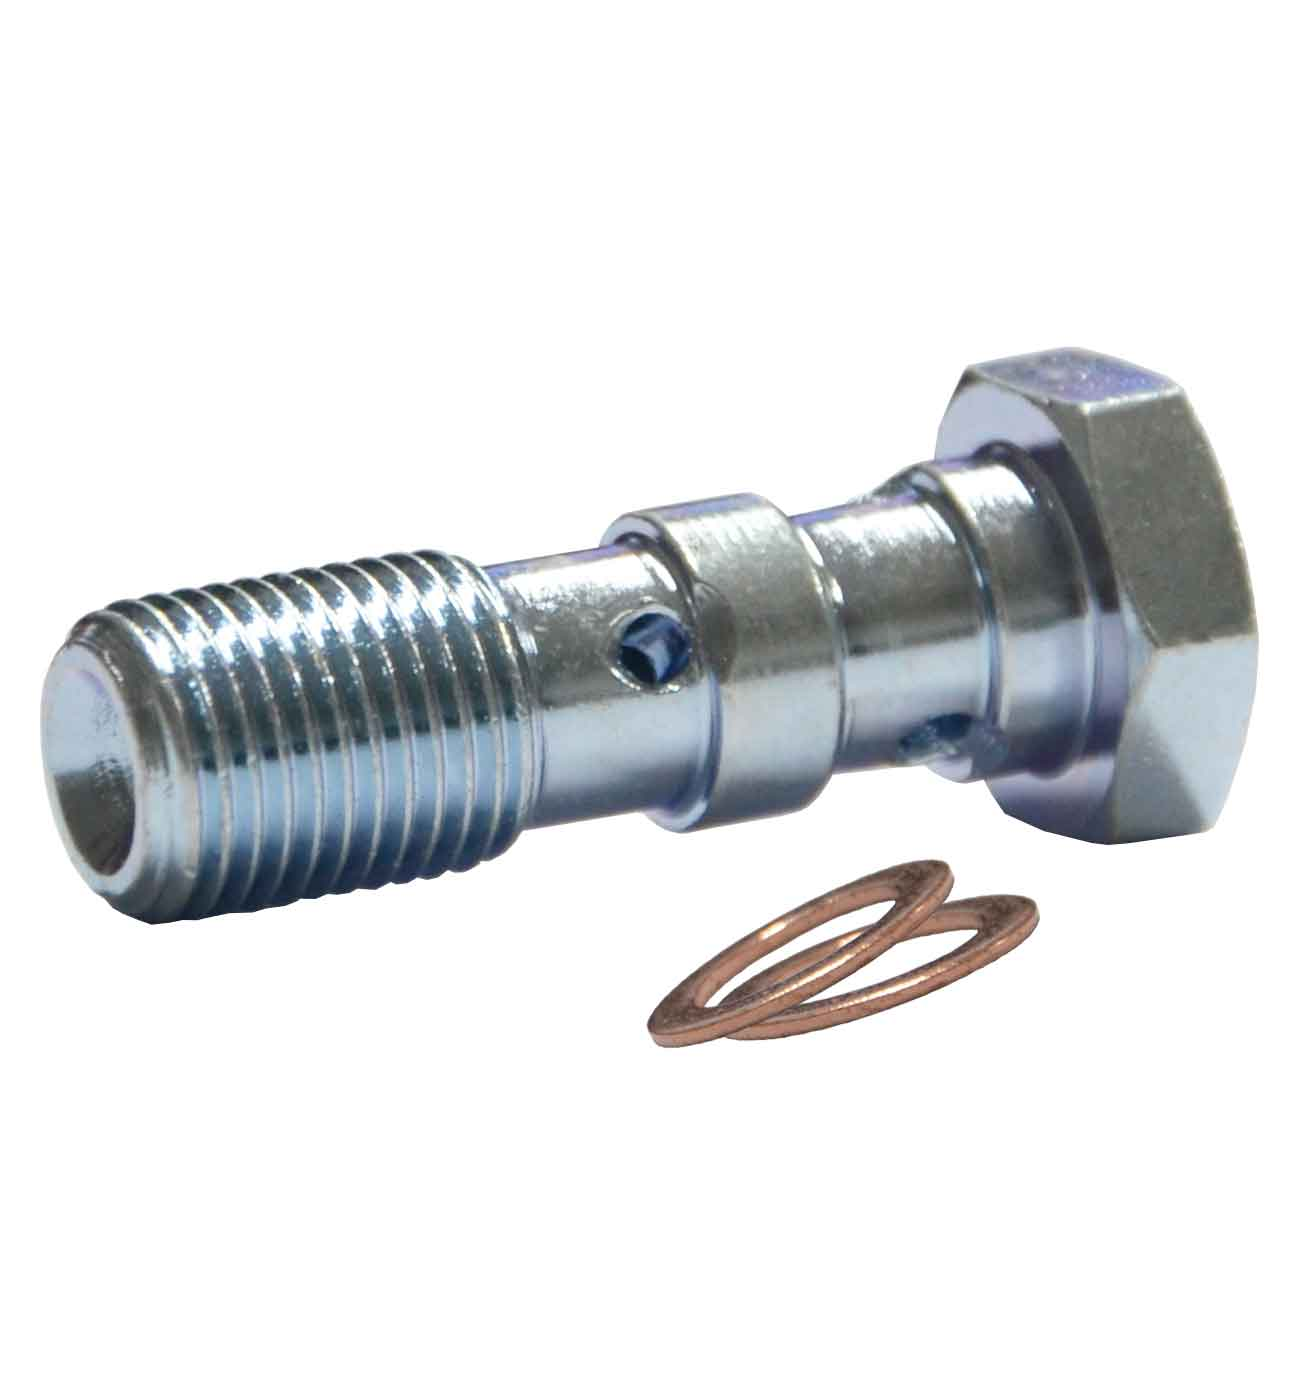 M10x1mm Double Banjo Bolt - Zinc Plated